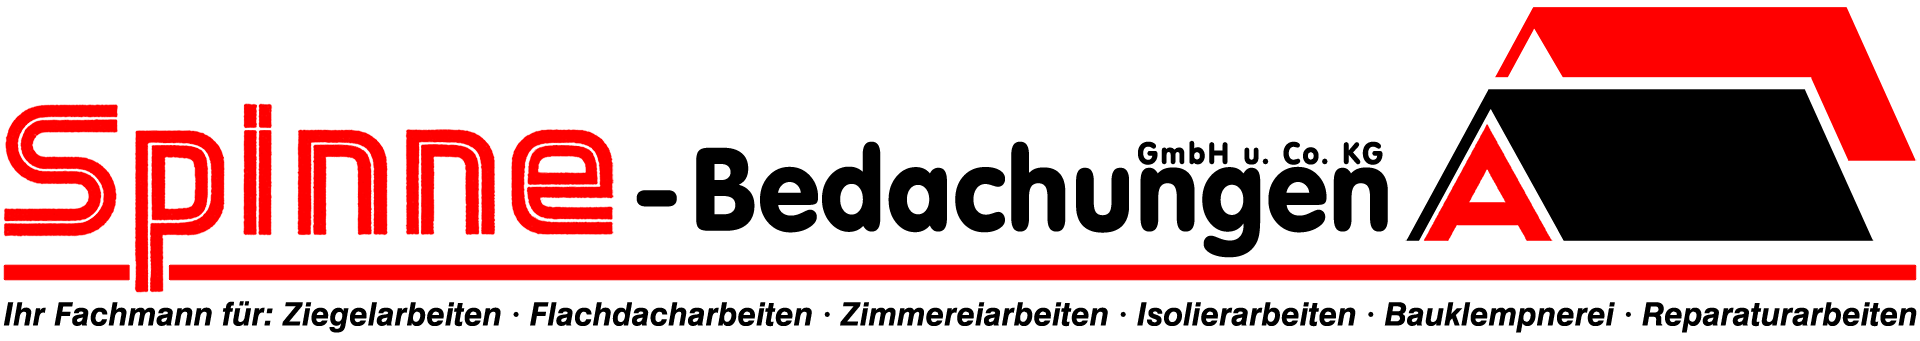 Spinne Bedachungen GmbH & Co.KG